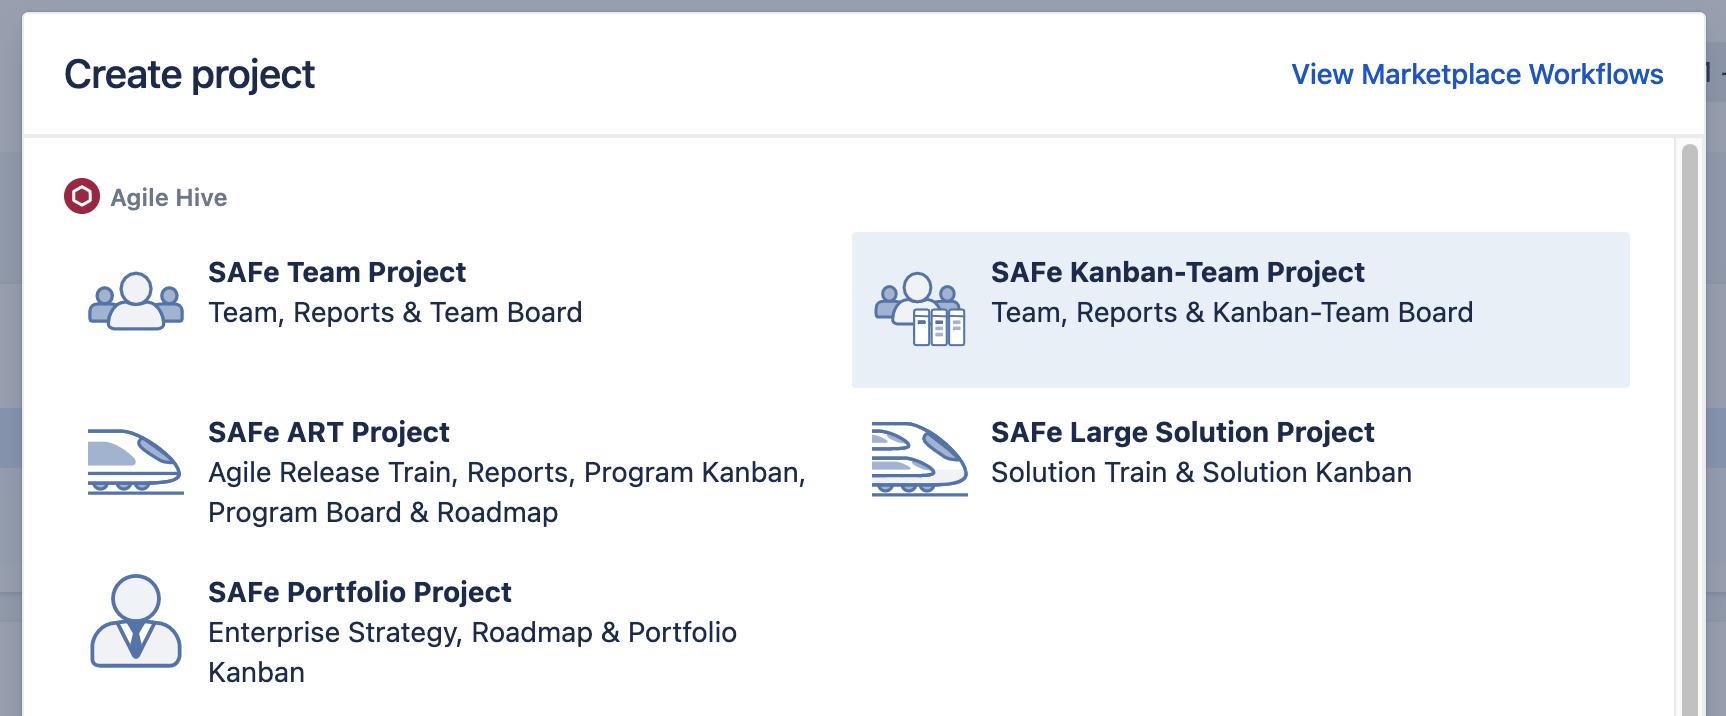 Agile Hive Kanban-Teams